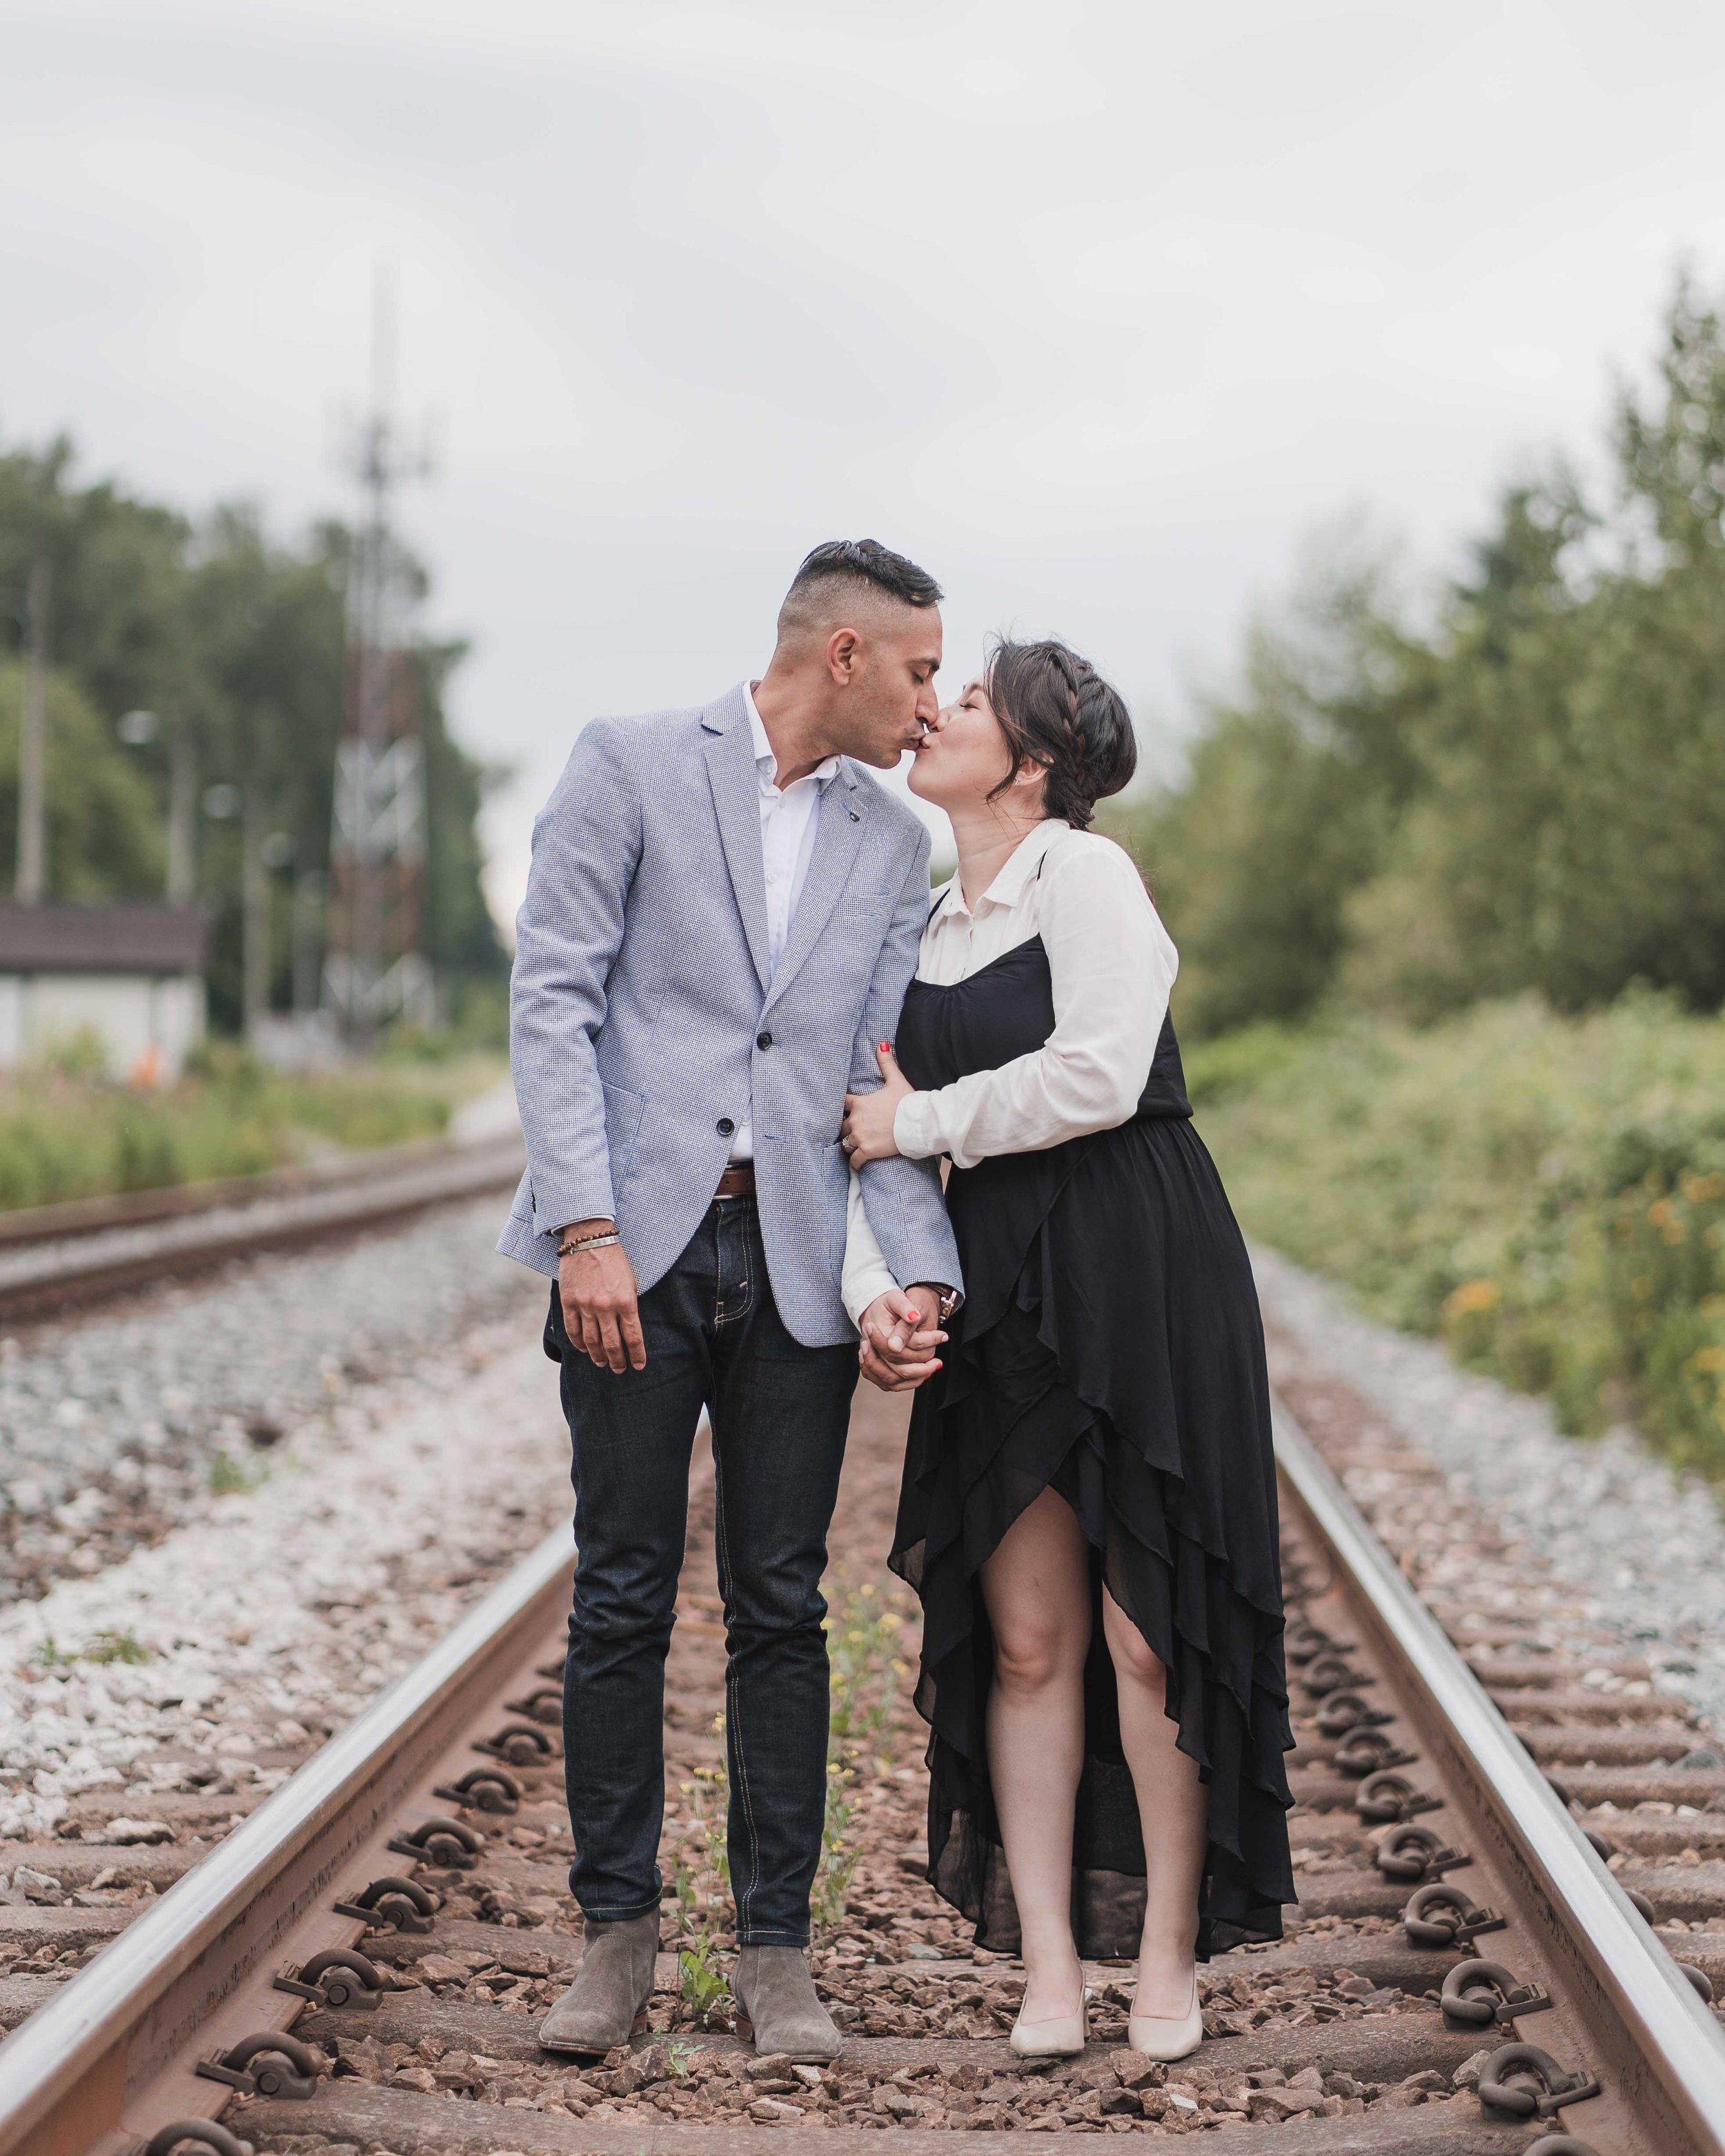 20190622 - Monika & Johnson Engagement - 0198.jpg